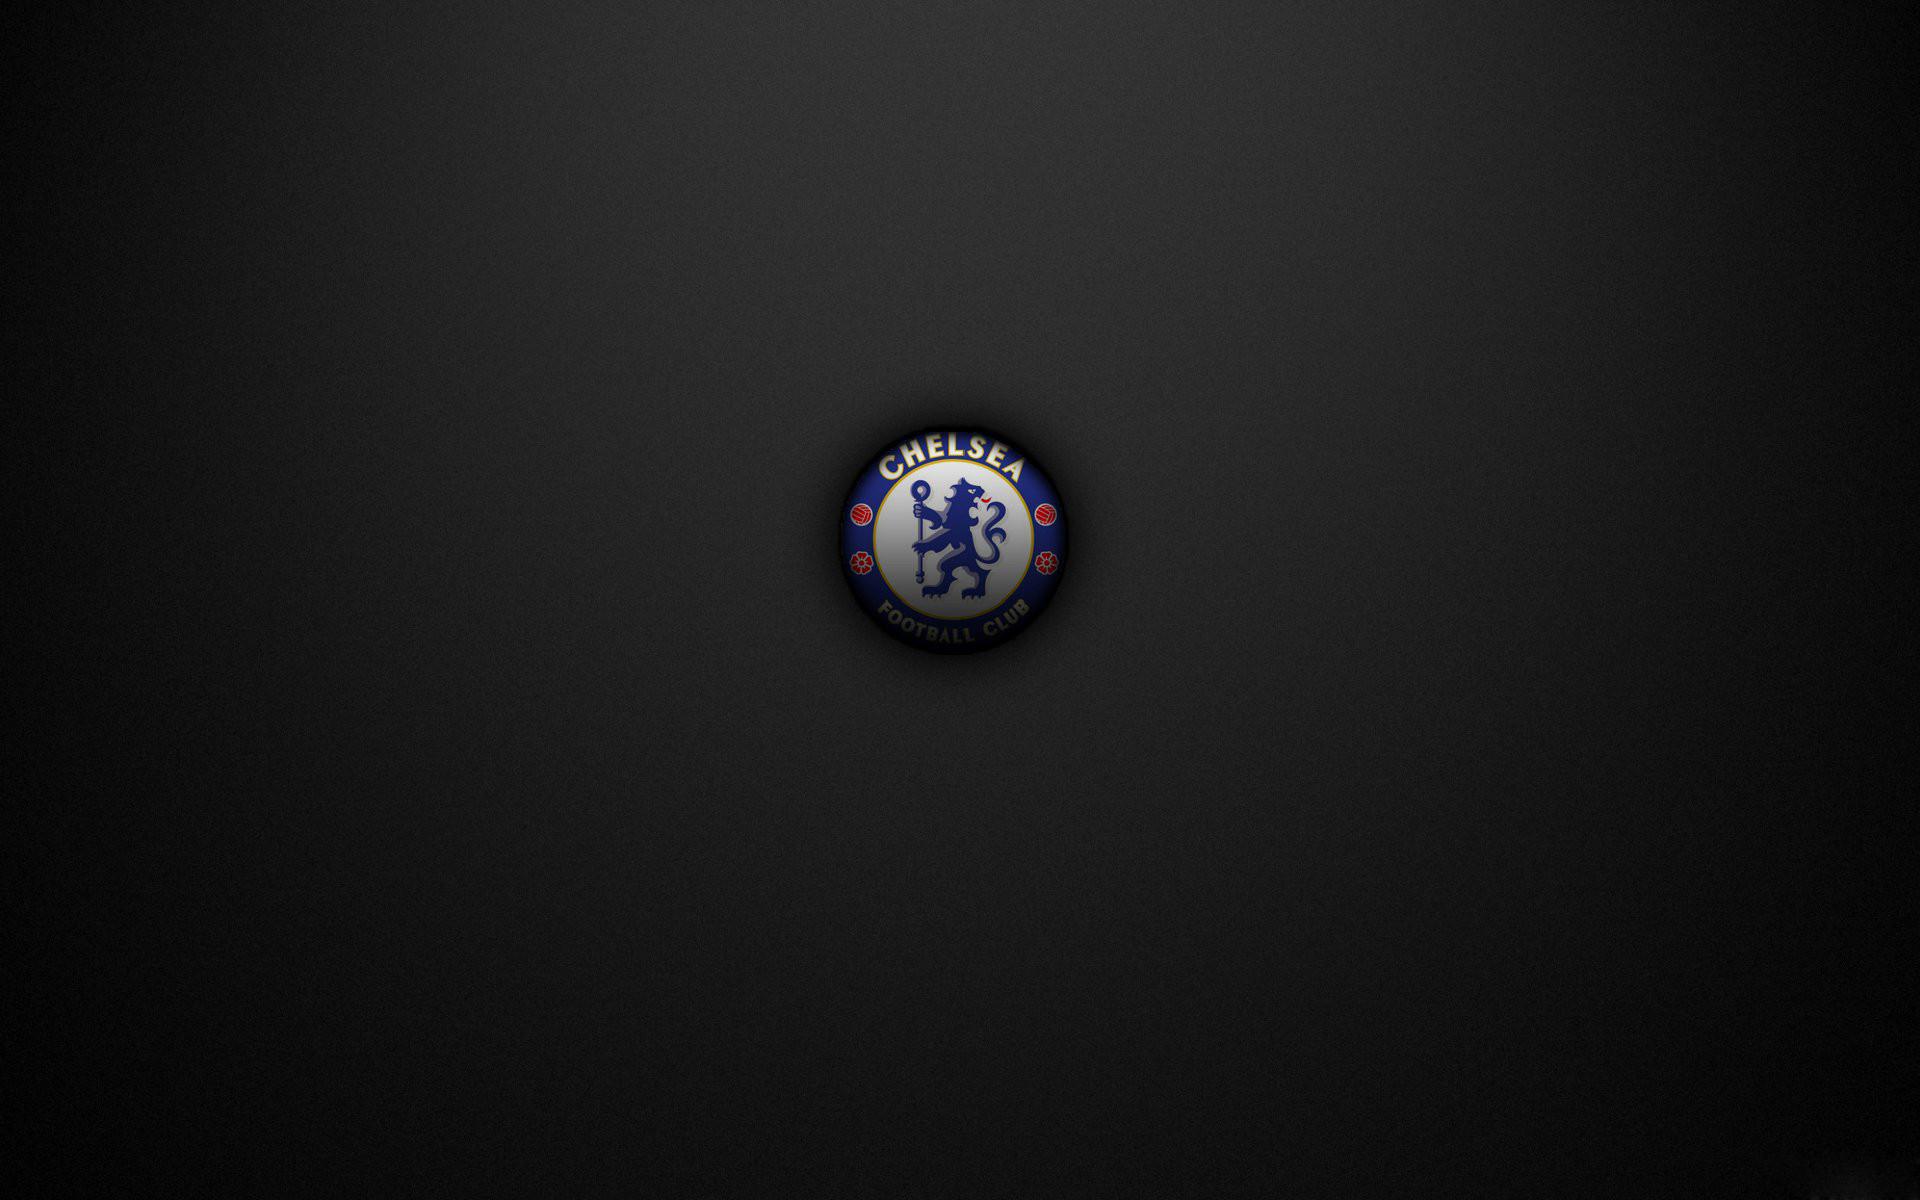 Chelsea Fc Desktop Wallpaper: Chelsea Wallpaper 2018 HD (68+ Images